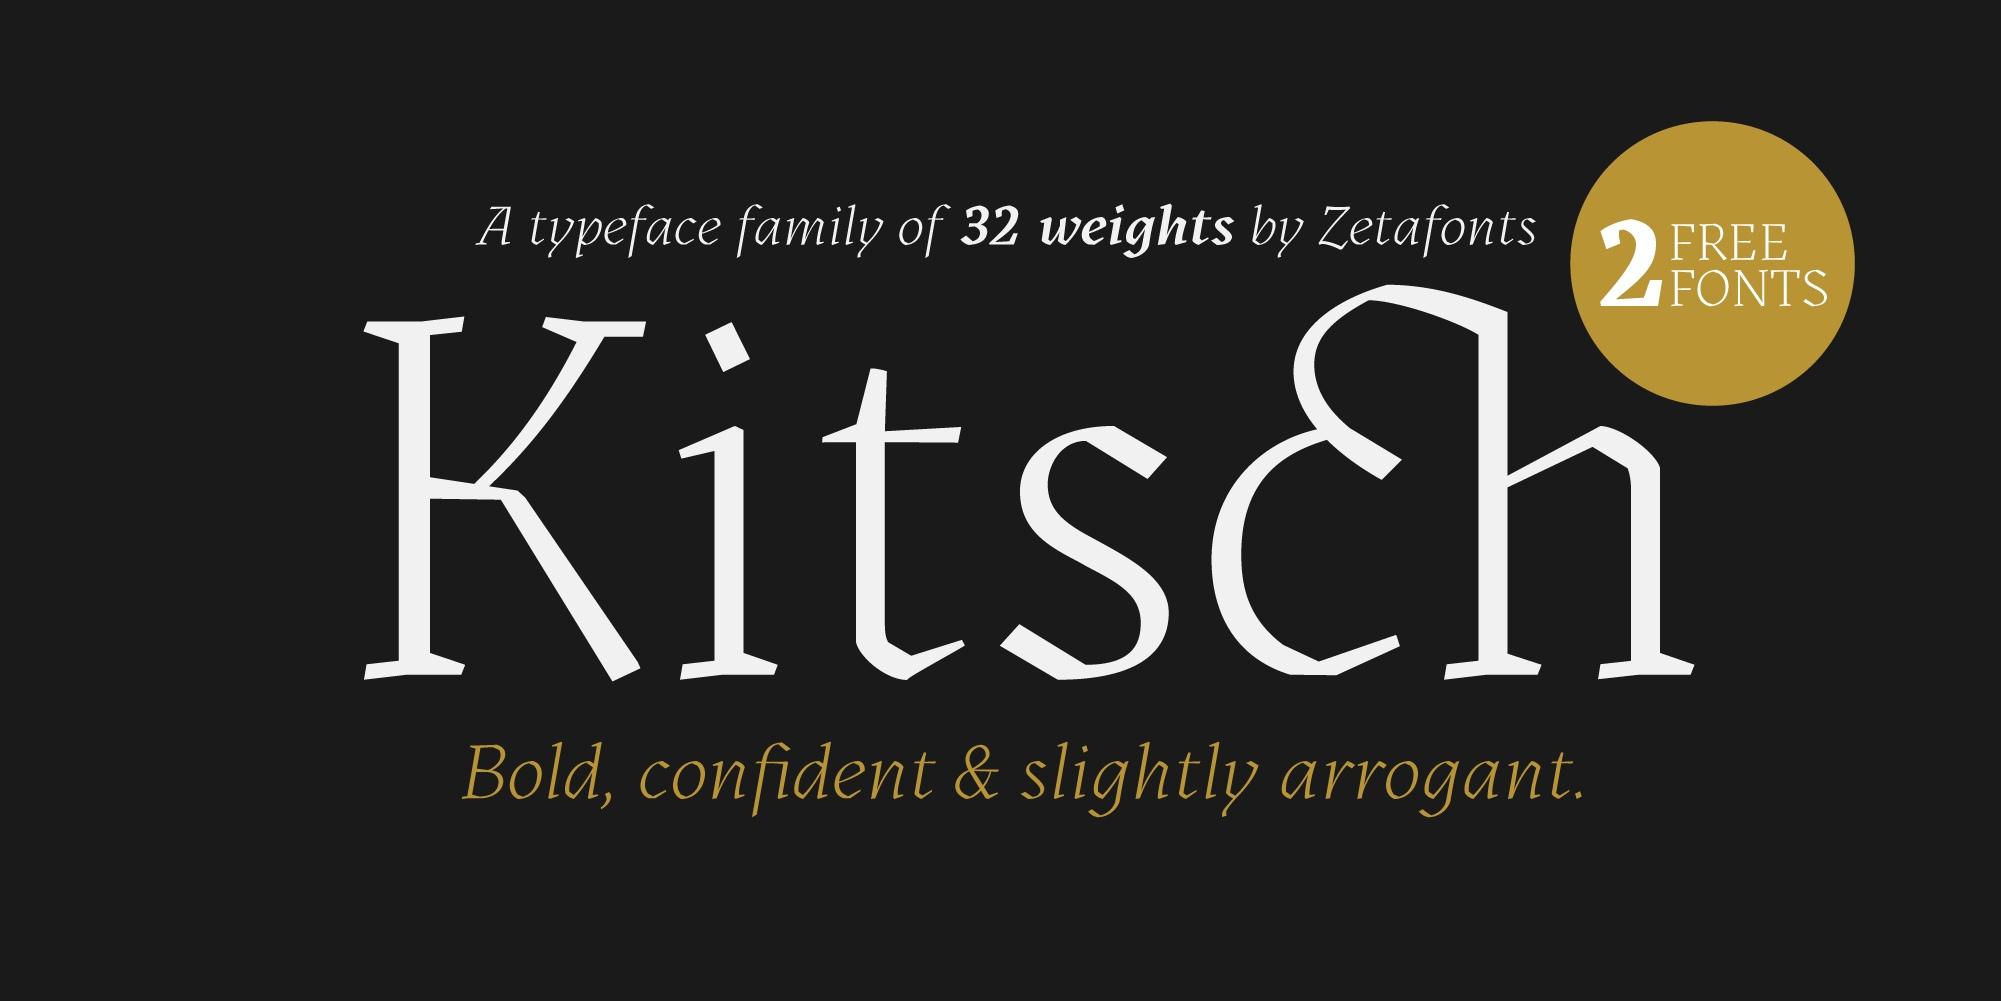 KitschKitsch衬线复古印刷排版设计英文字体下载